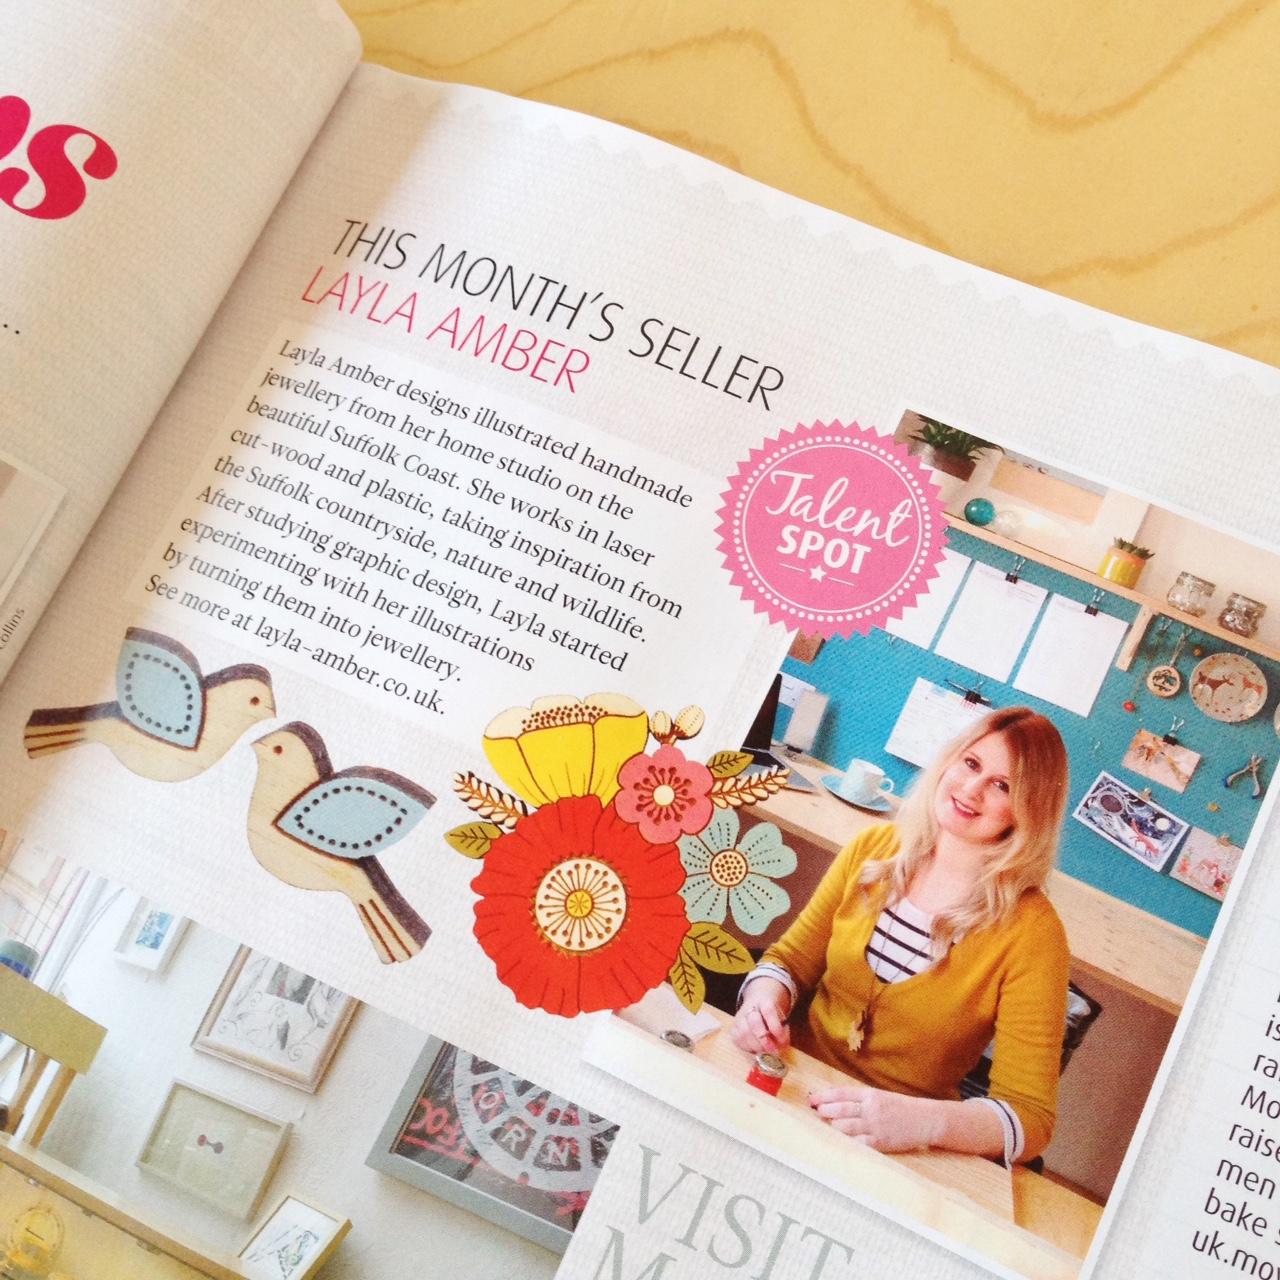 Craftseller magazine issue 43 November 2015